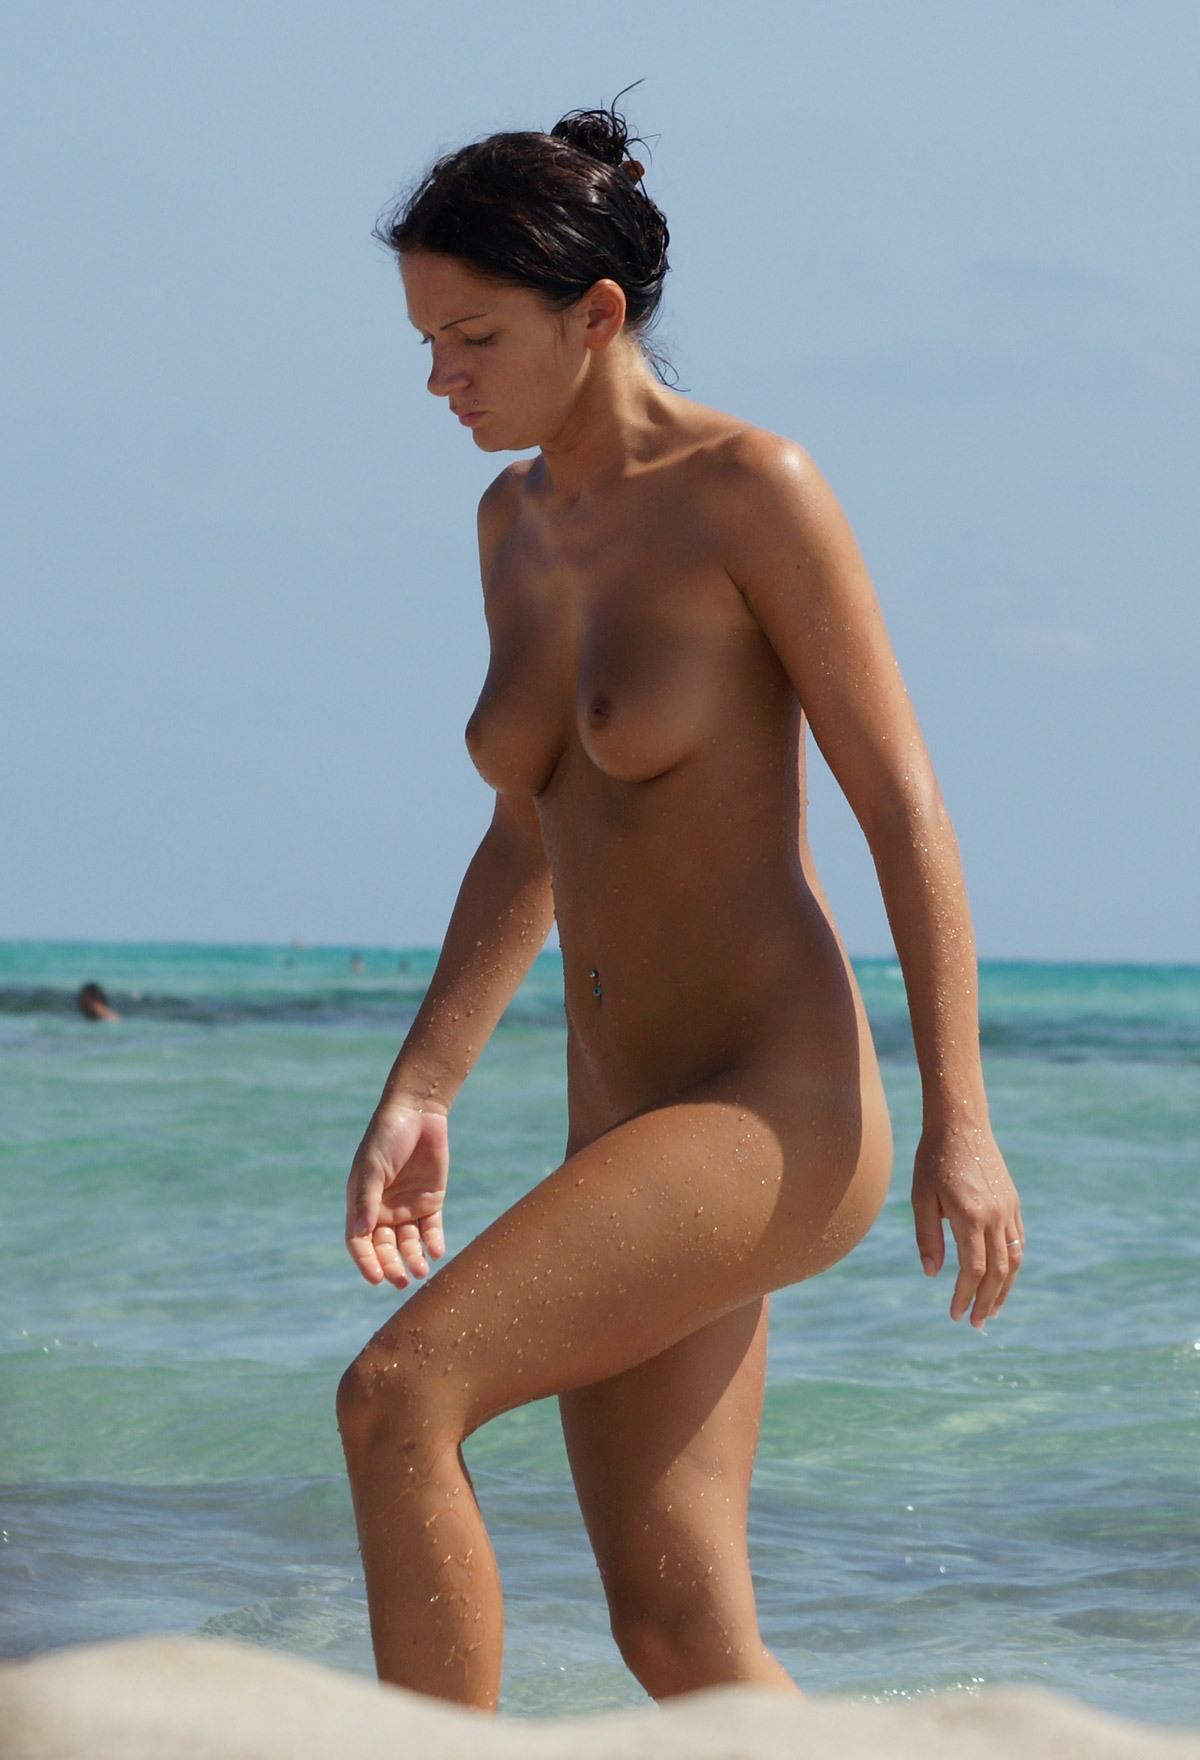 Nude beach hotties